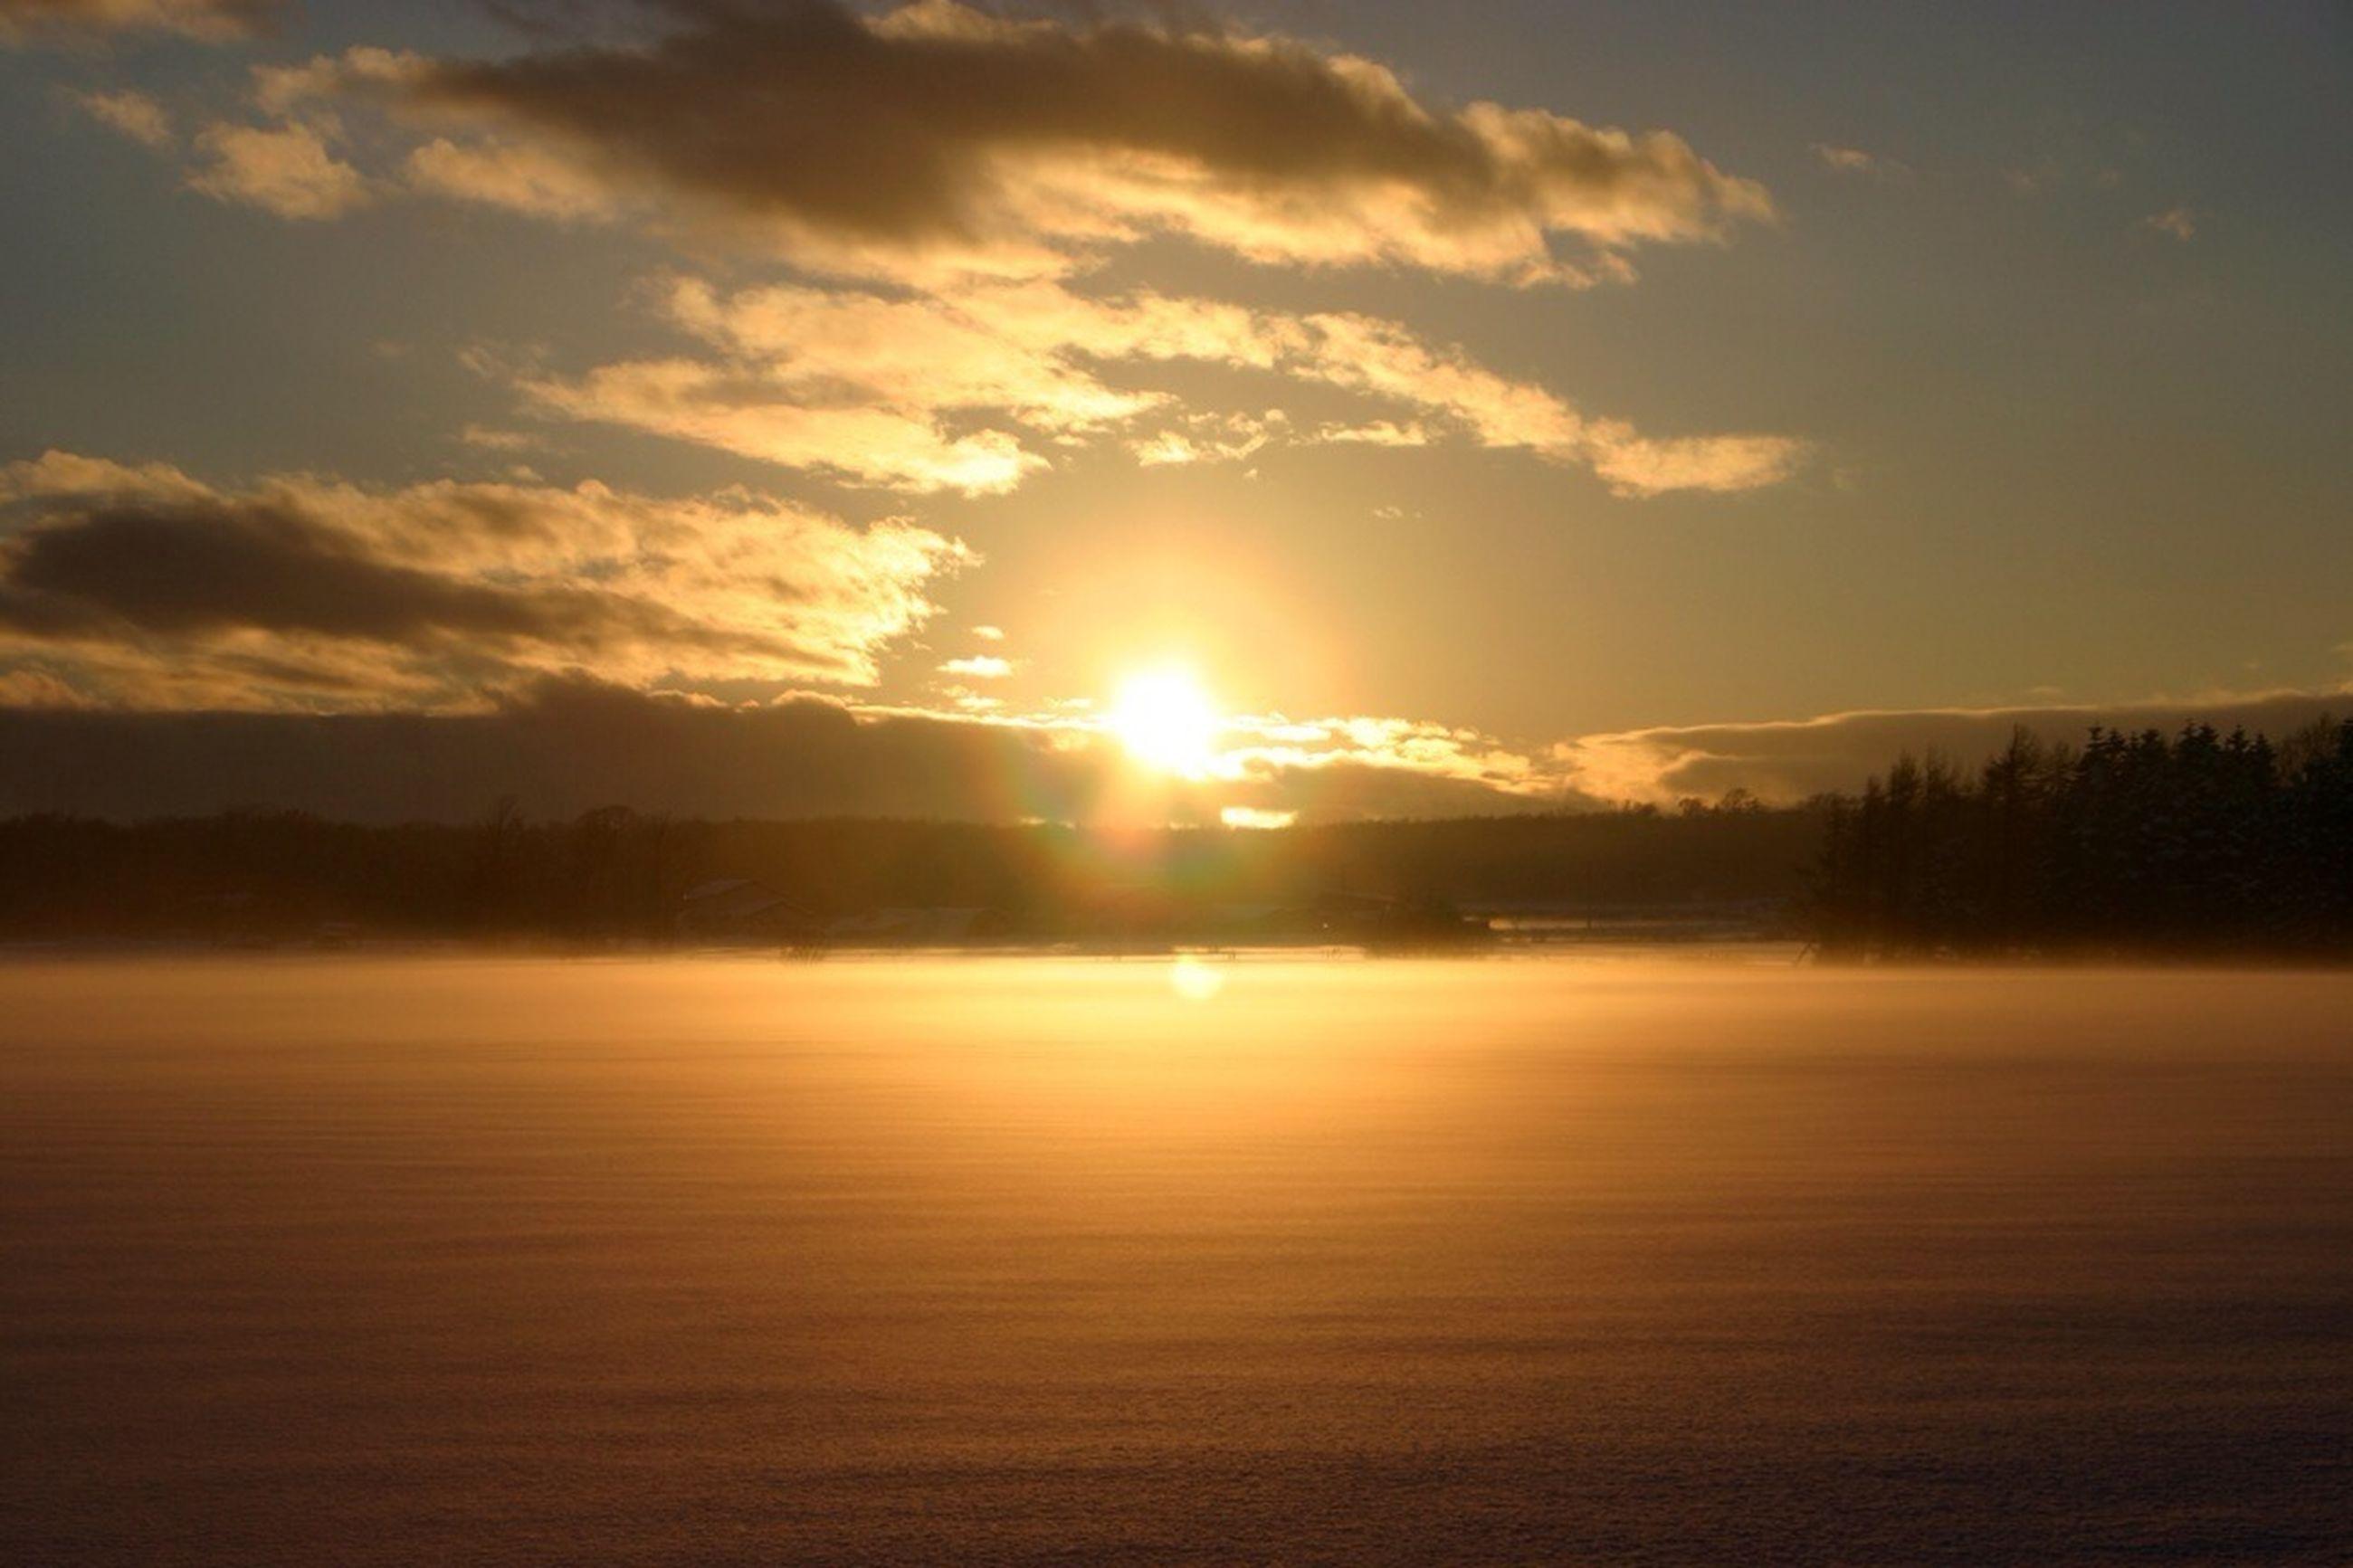 sunset, sun, tranquil scene, scenics, tranquility, beauty in nature, orange color, sky, water, nature, idyllic, silhouette, reflection, sunlight, waterfront, cloud - sky, lake, sunbeam, landscape, non-urban scene